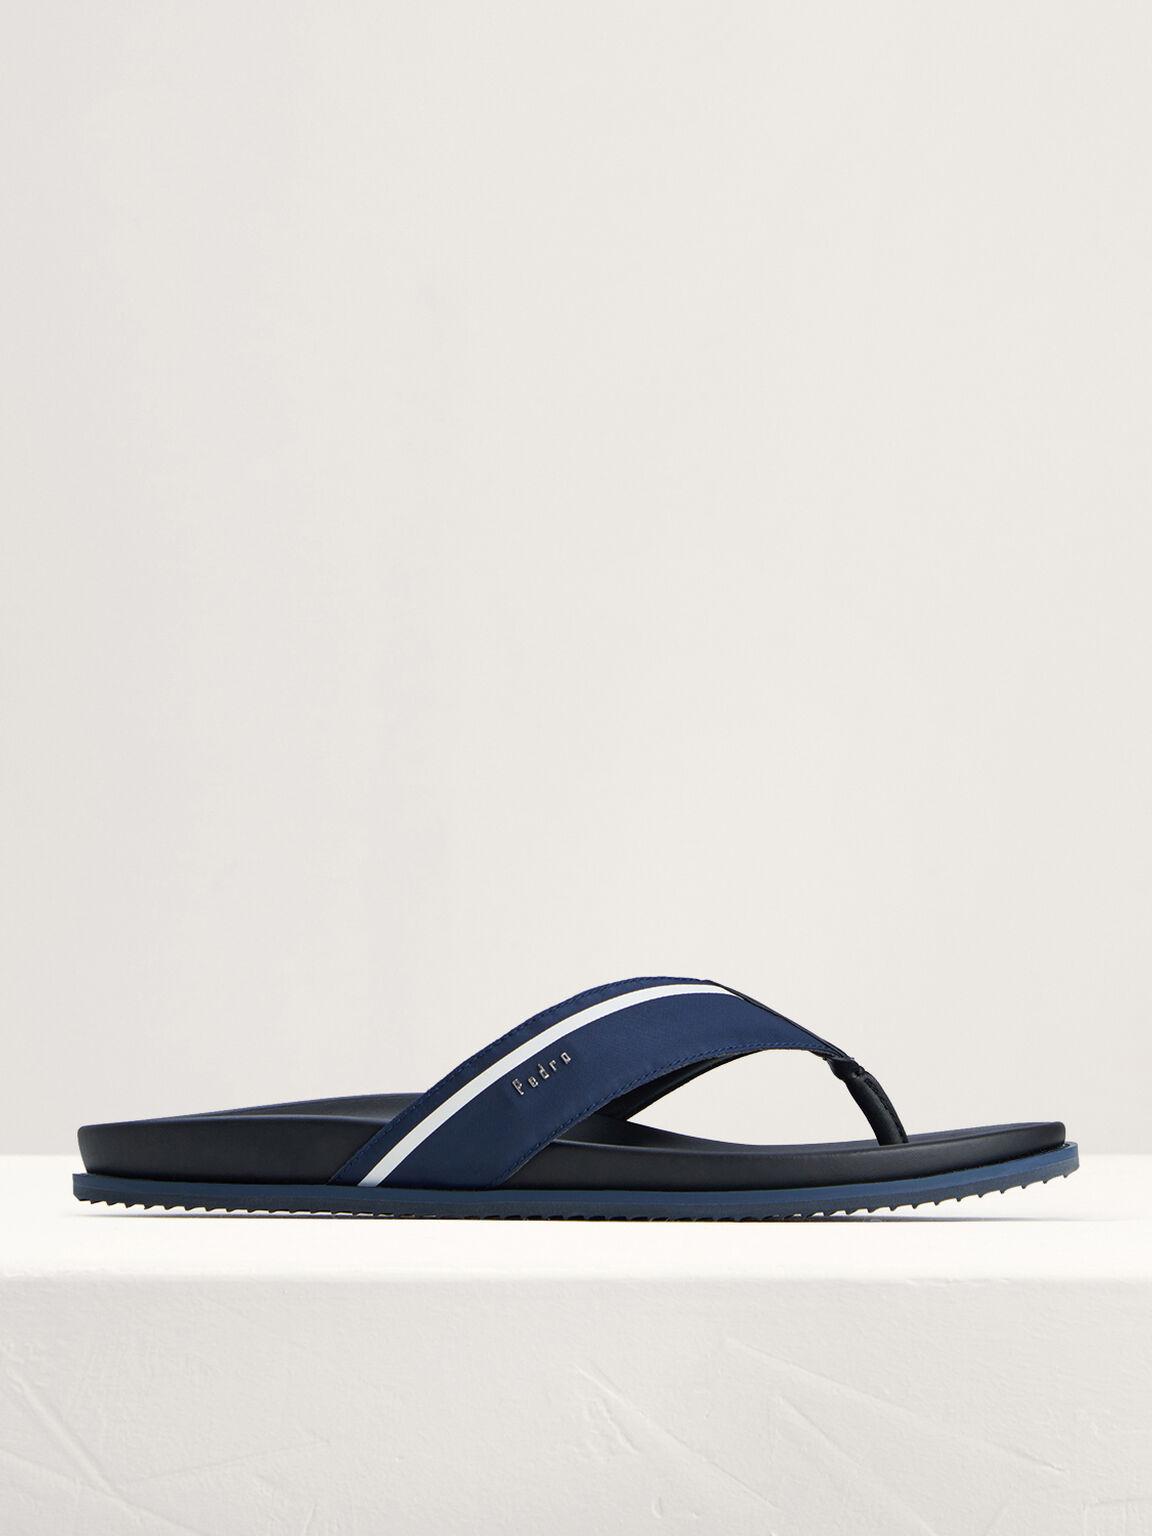 Nylon Thong Sandals, Navy, hi-res